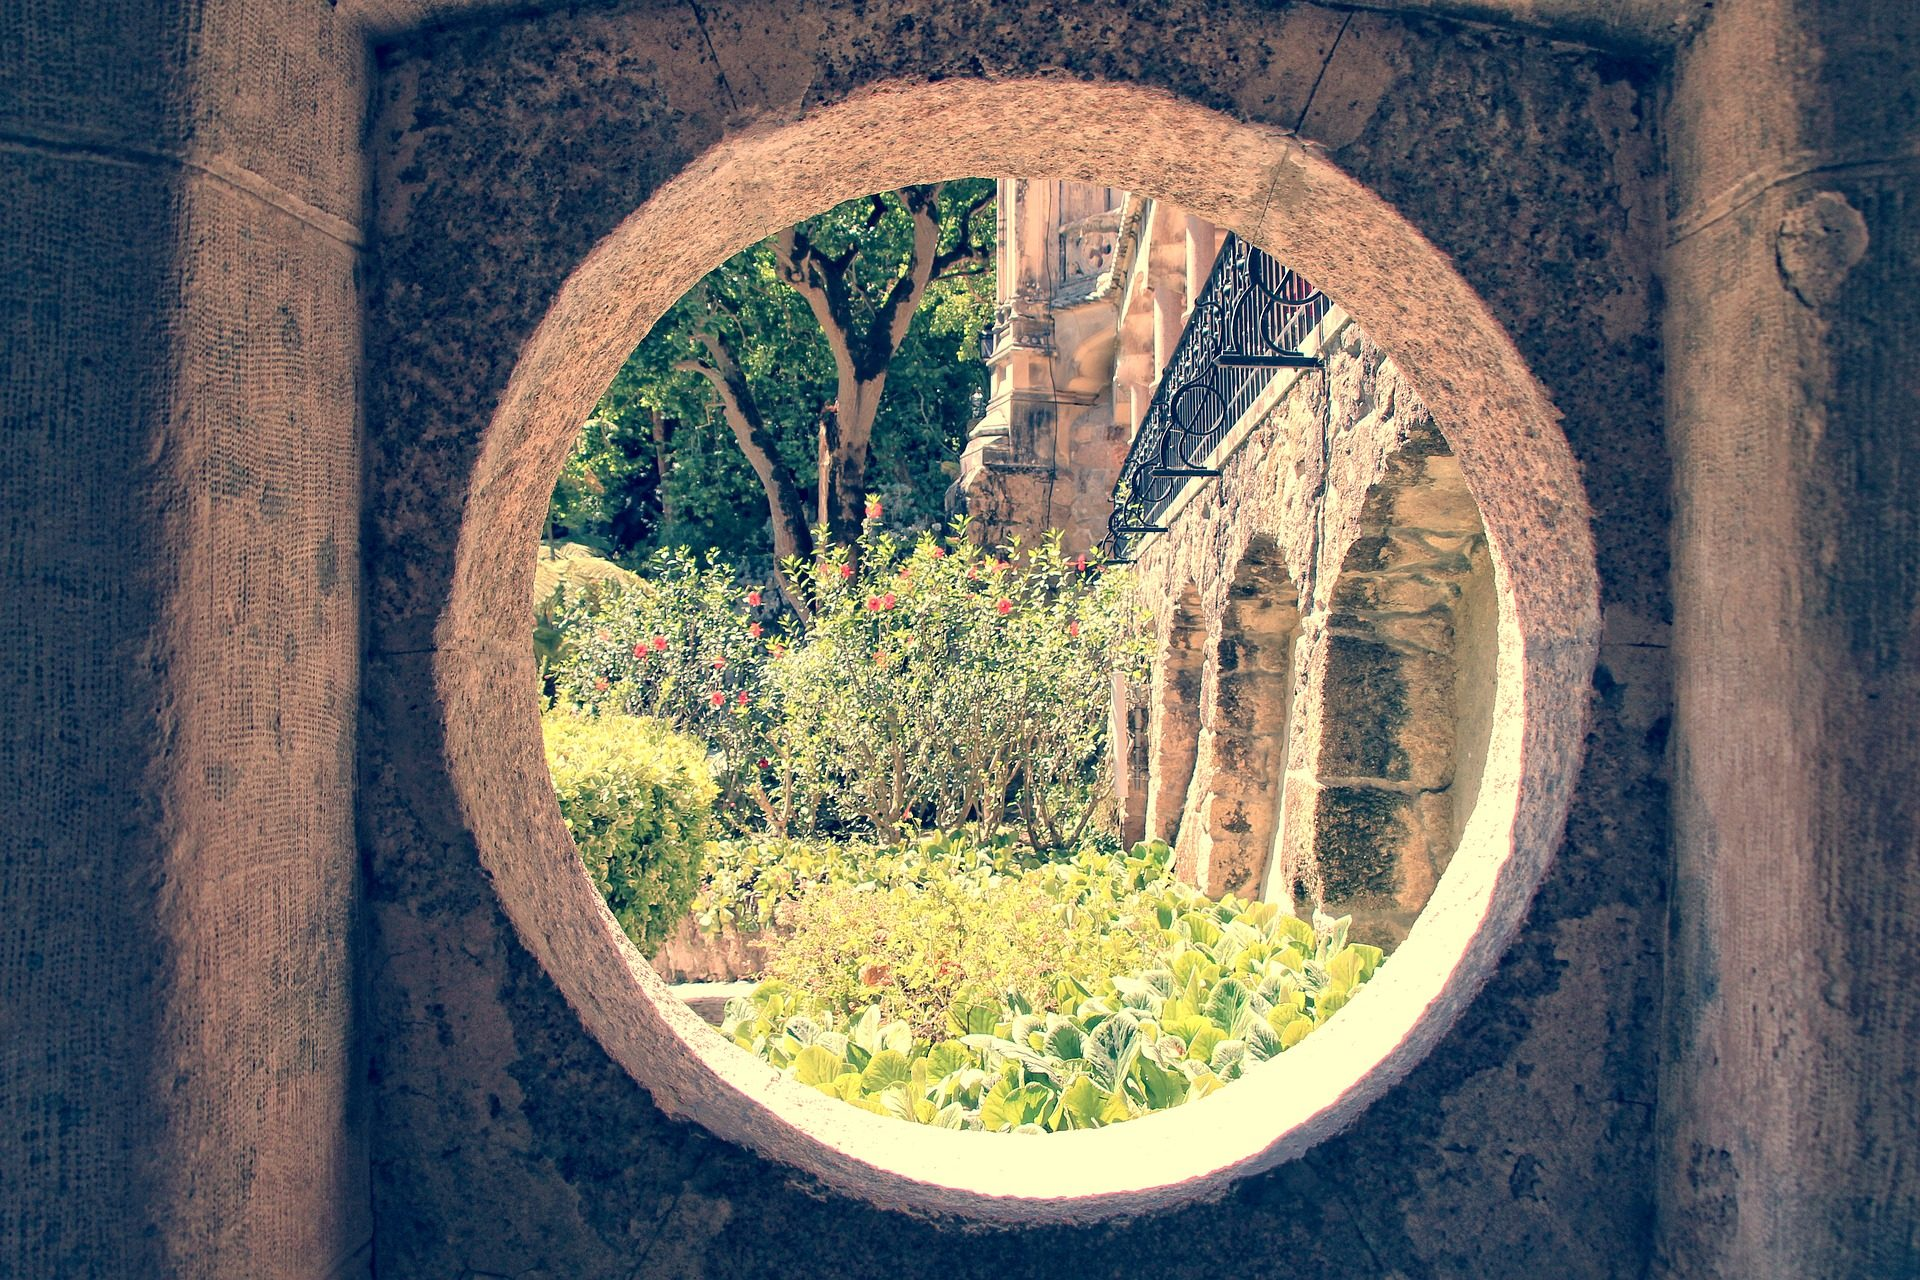 jardín, plantas, hueco, ventana, palacio, sintra, lisboa - Fondos de Pantalla HD - professor-falken.com